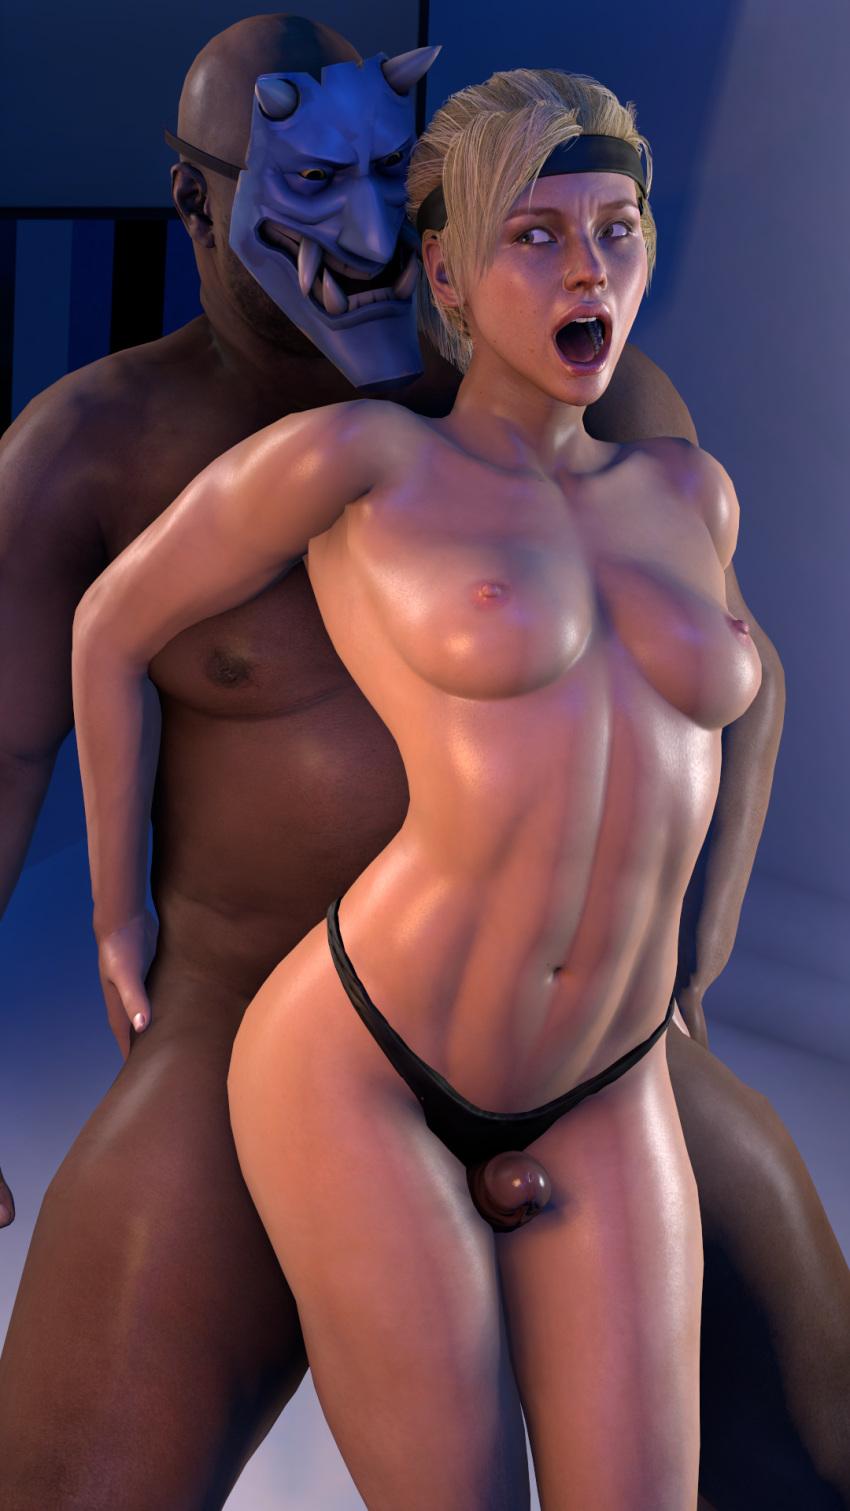 2 sin sex divinity mods original Zora in breath of the wild